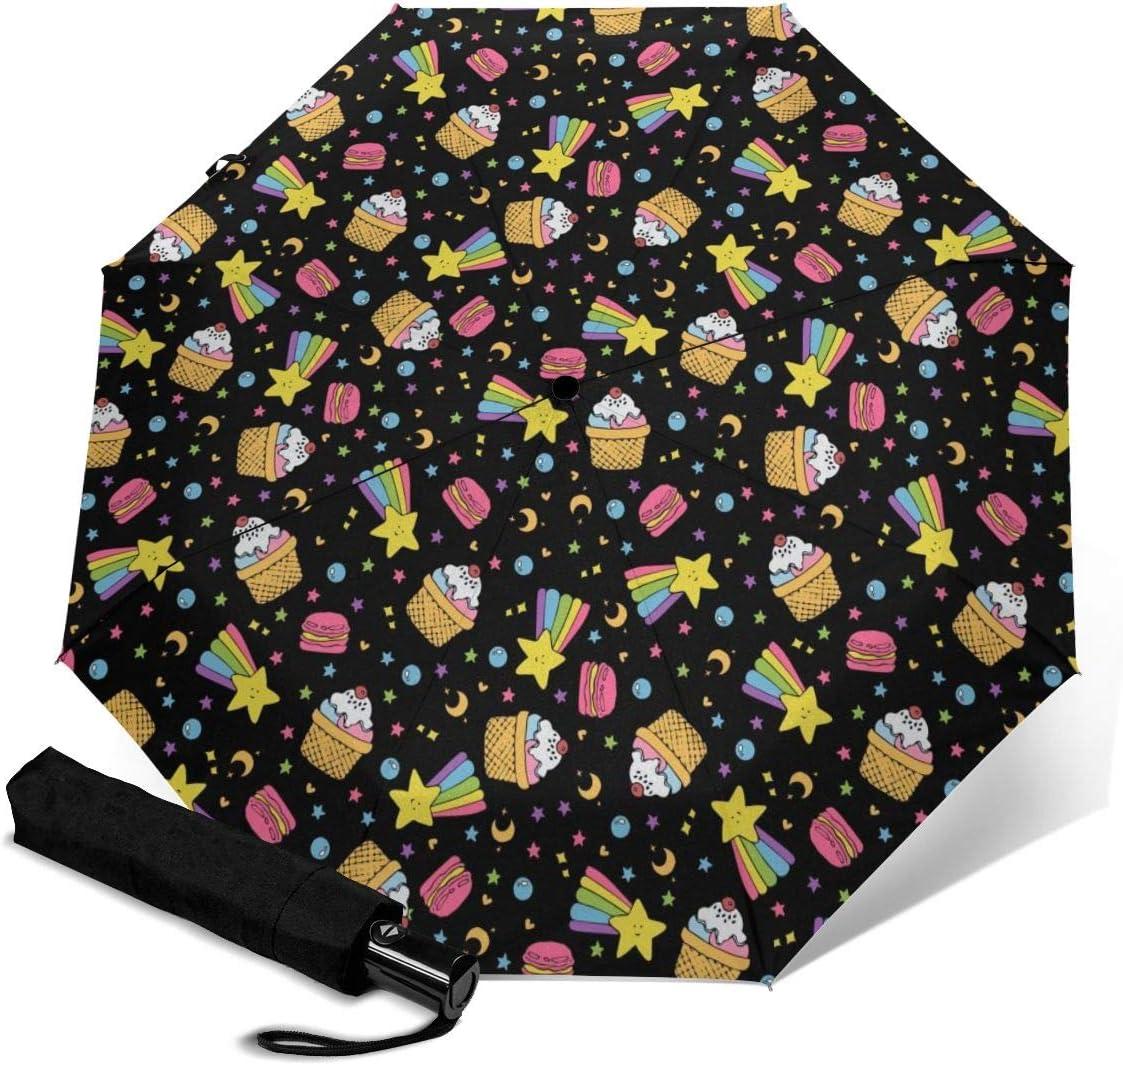 Cute Cake Space Pattern Automatic Folding Umbrella Super Sunscreen Rain Portable Creative UV Protection Tri-Fold Umbrella